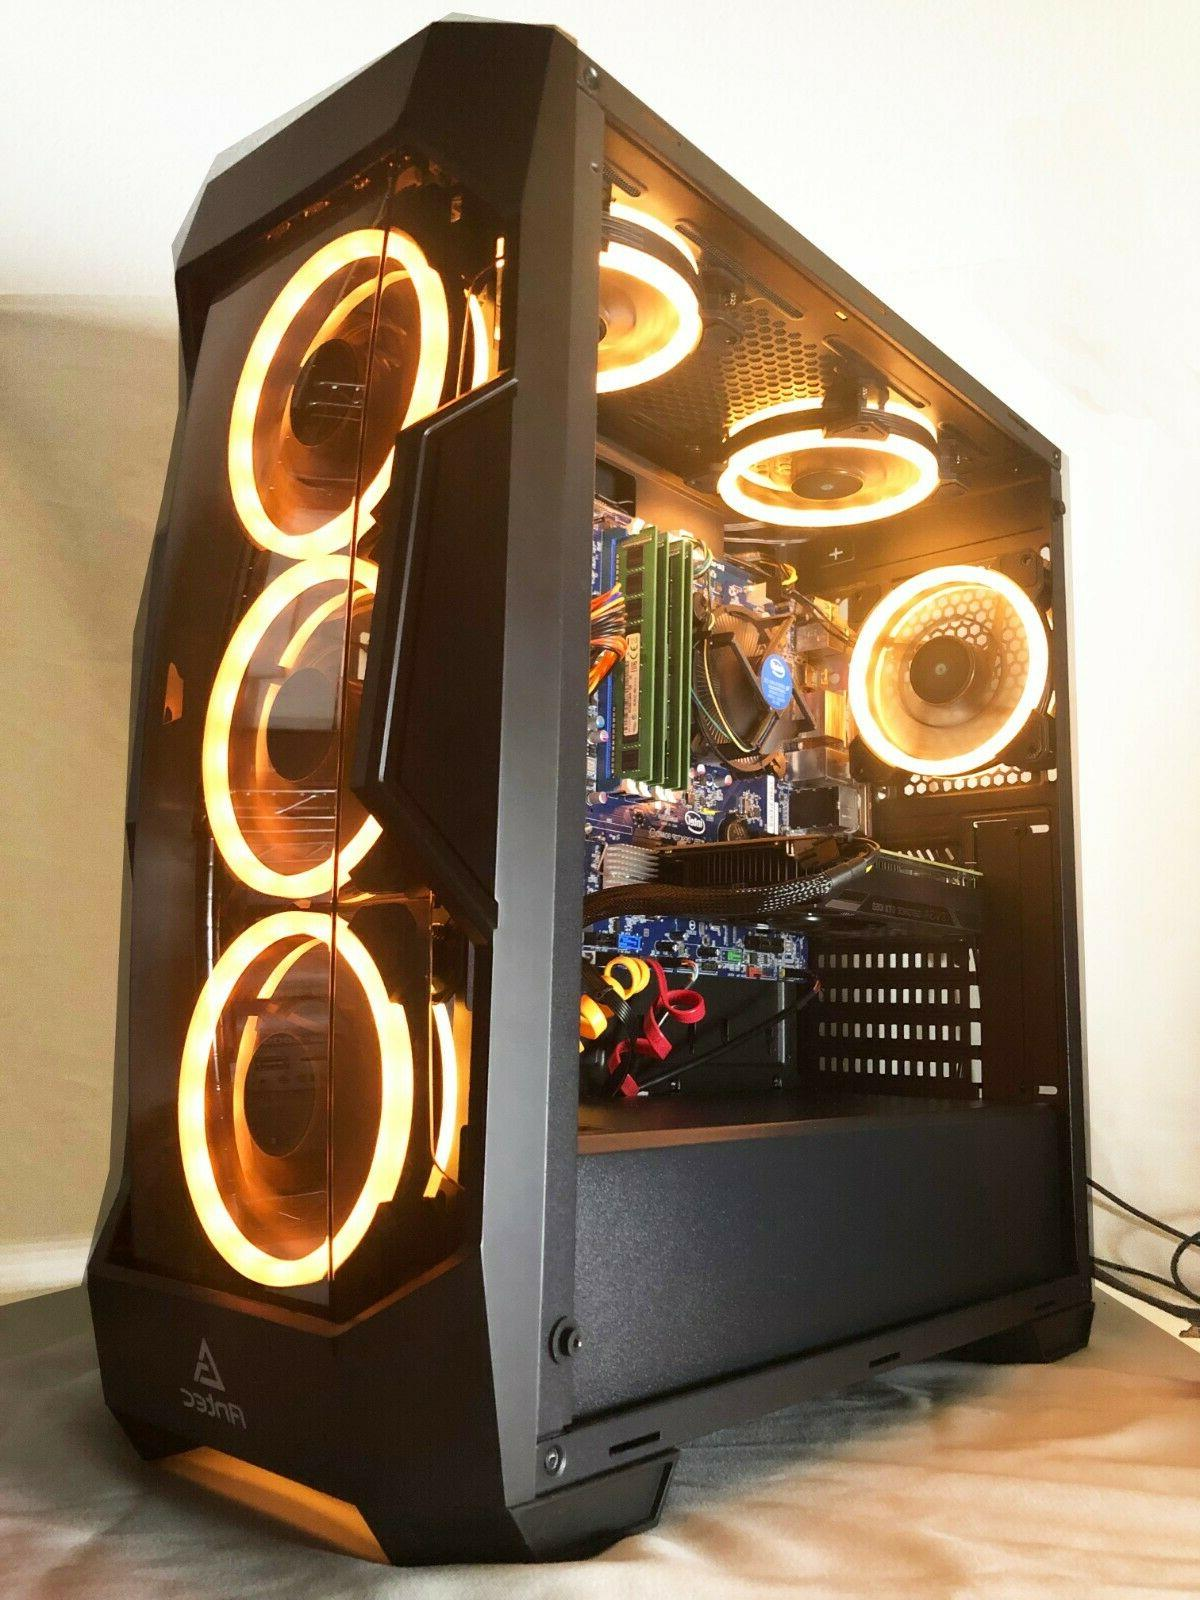 Gaming Intel i7-3.40GHz,120GB SSD,16GB,2TB,Nvidia GTX1060,WiFi,Win10